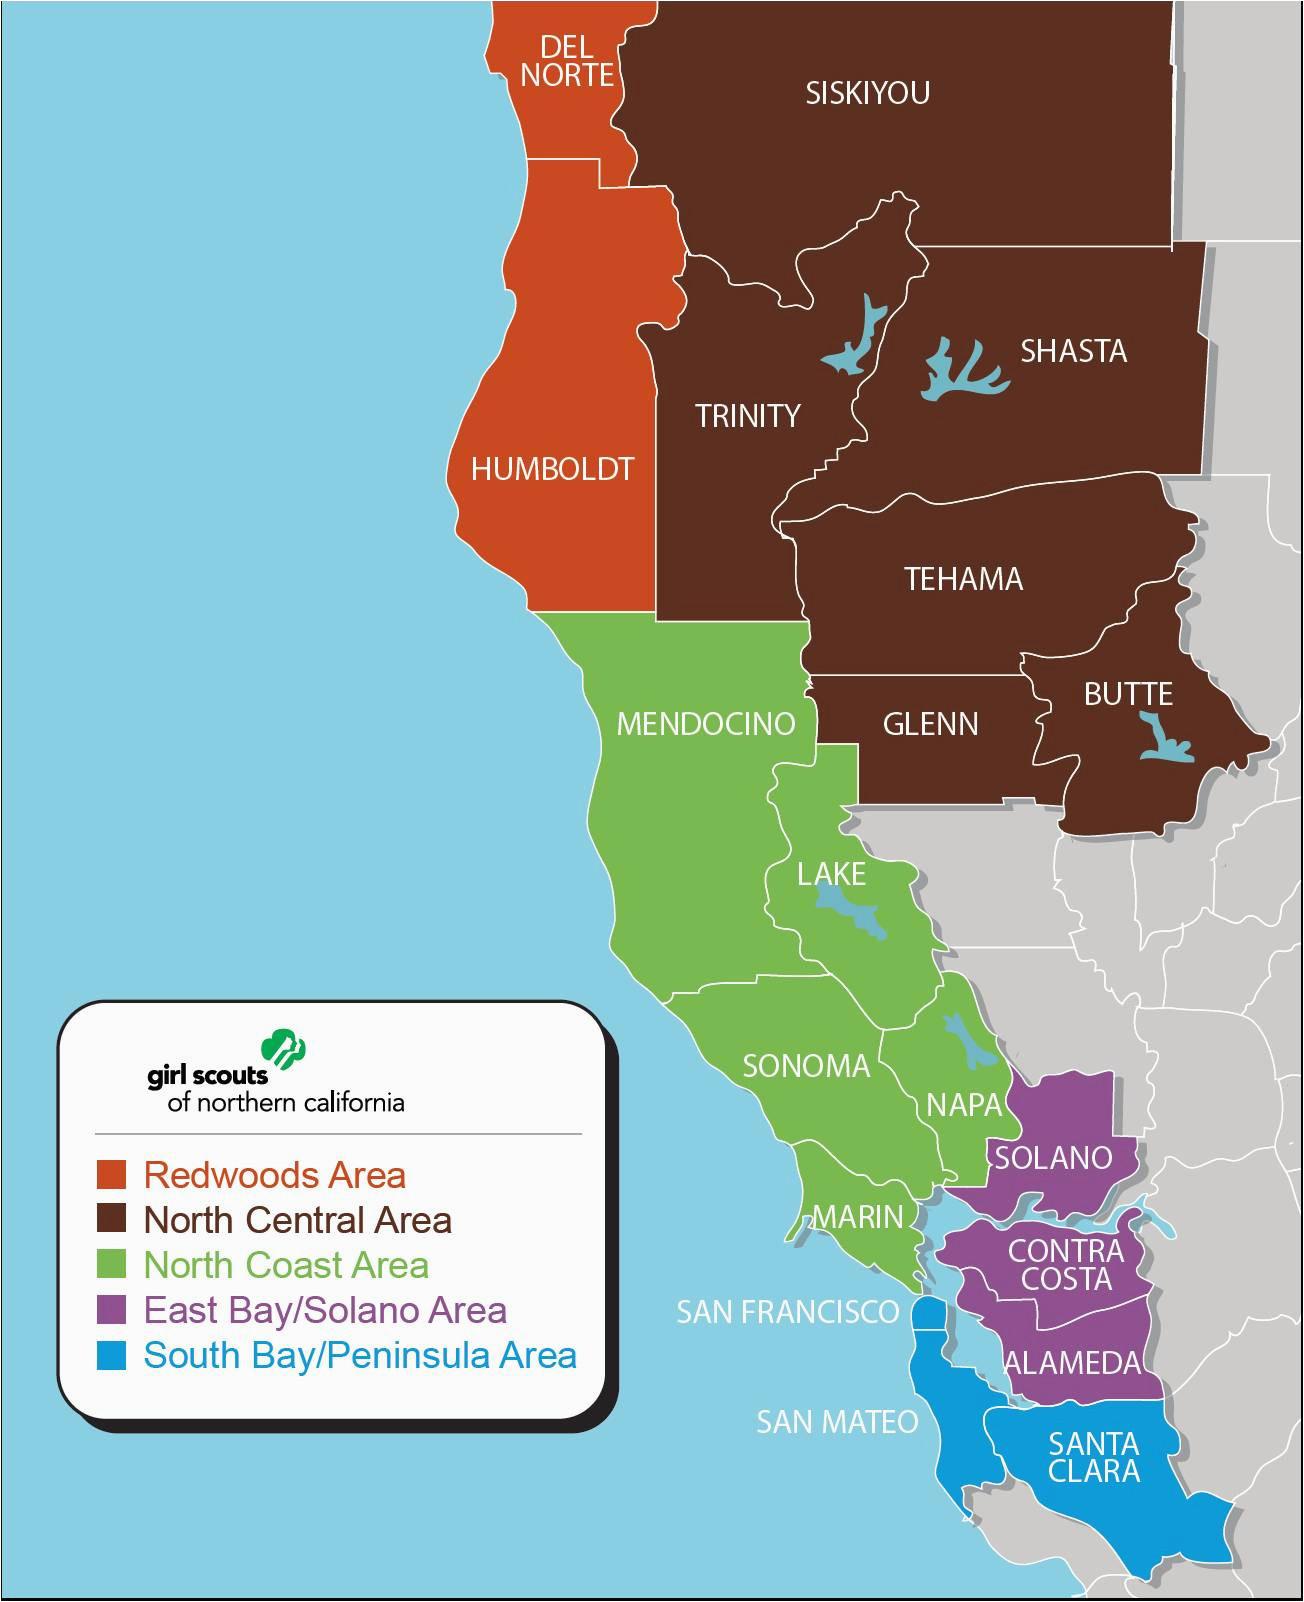 sex offender registry map california ettcarworld com